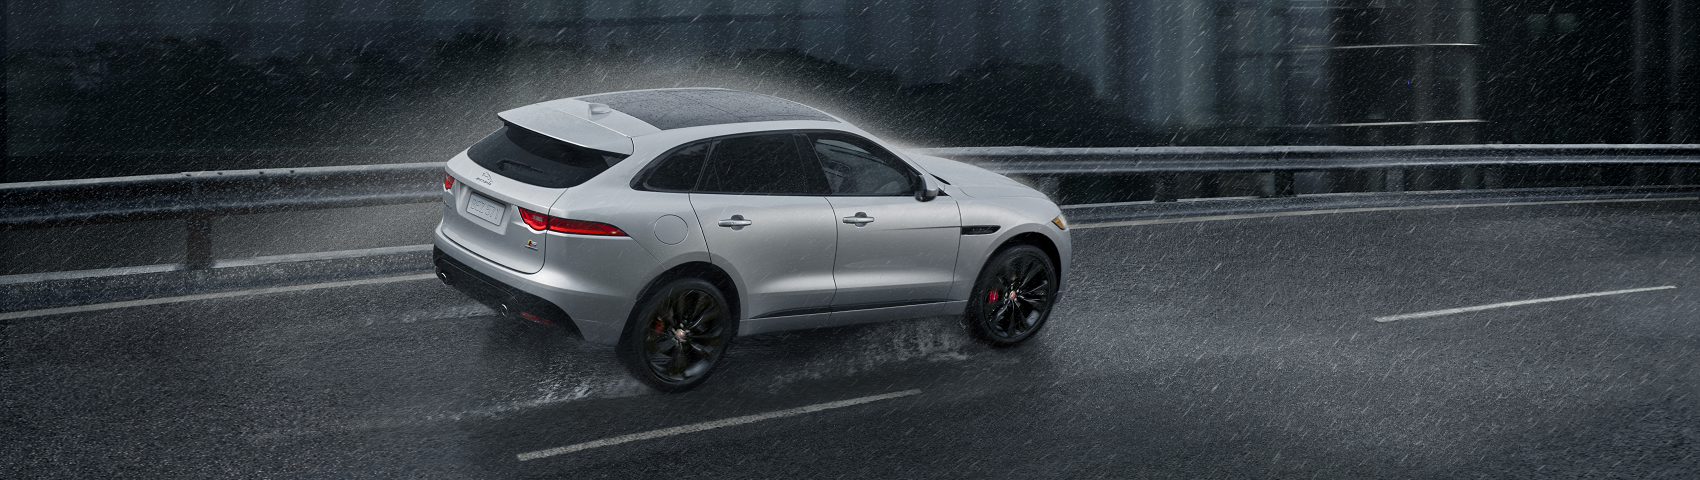 Jaguar SUV near Staten Island NY